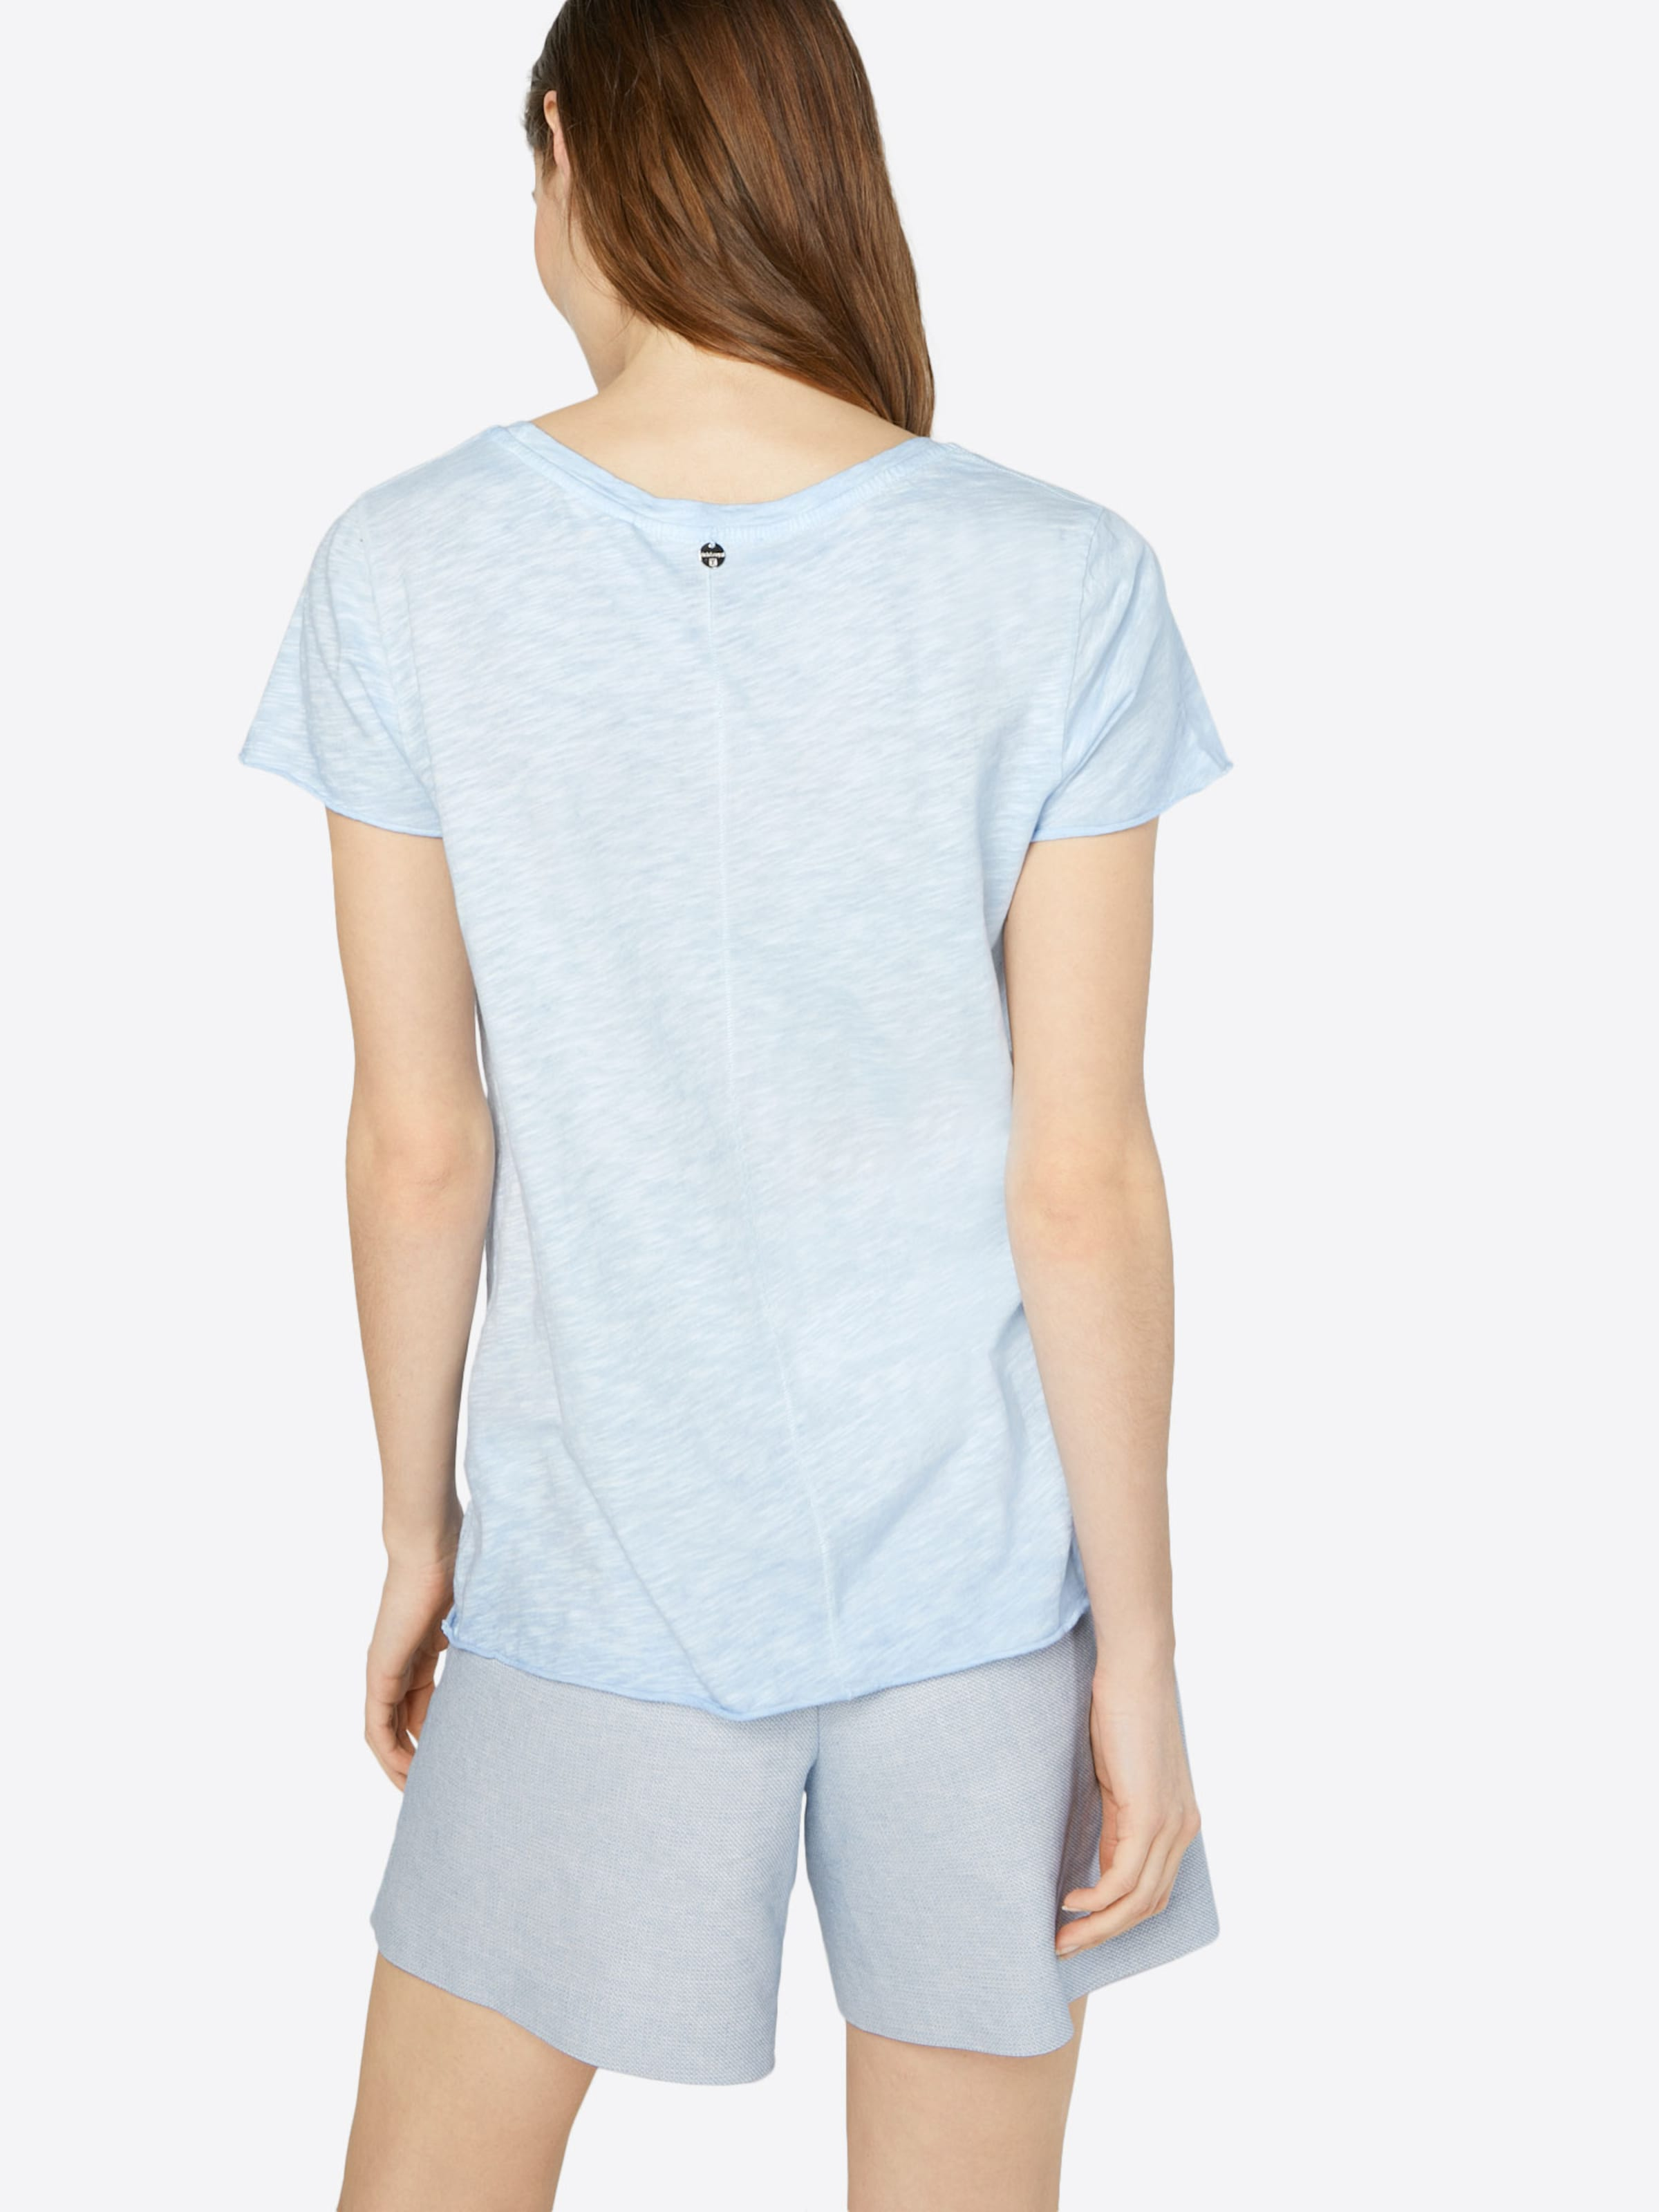 Rabatte Günstig Online Günstiger Preis Großhandel Rich & Royal T-Shirt Gor1xv3Aj